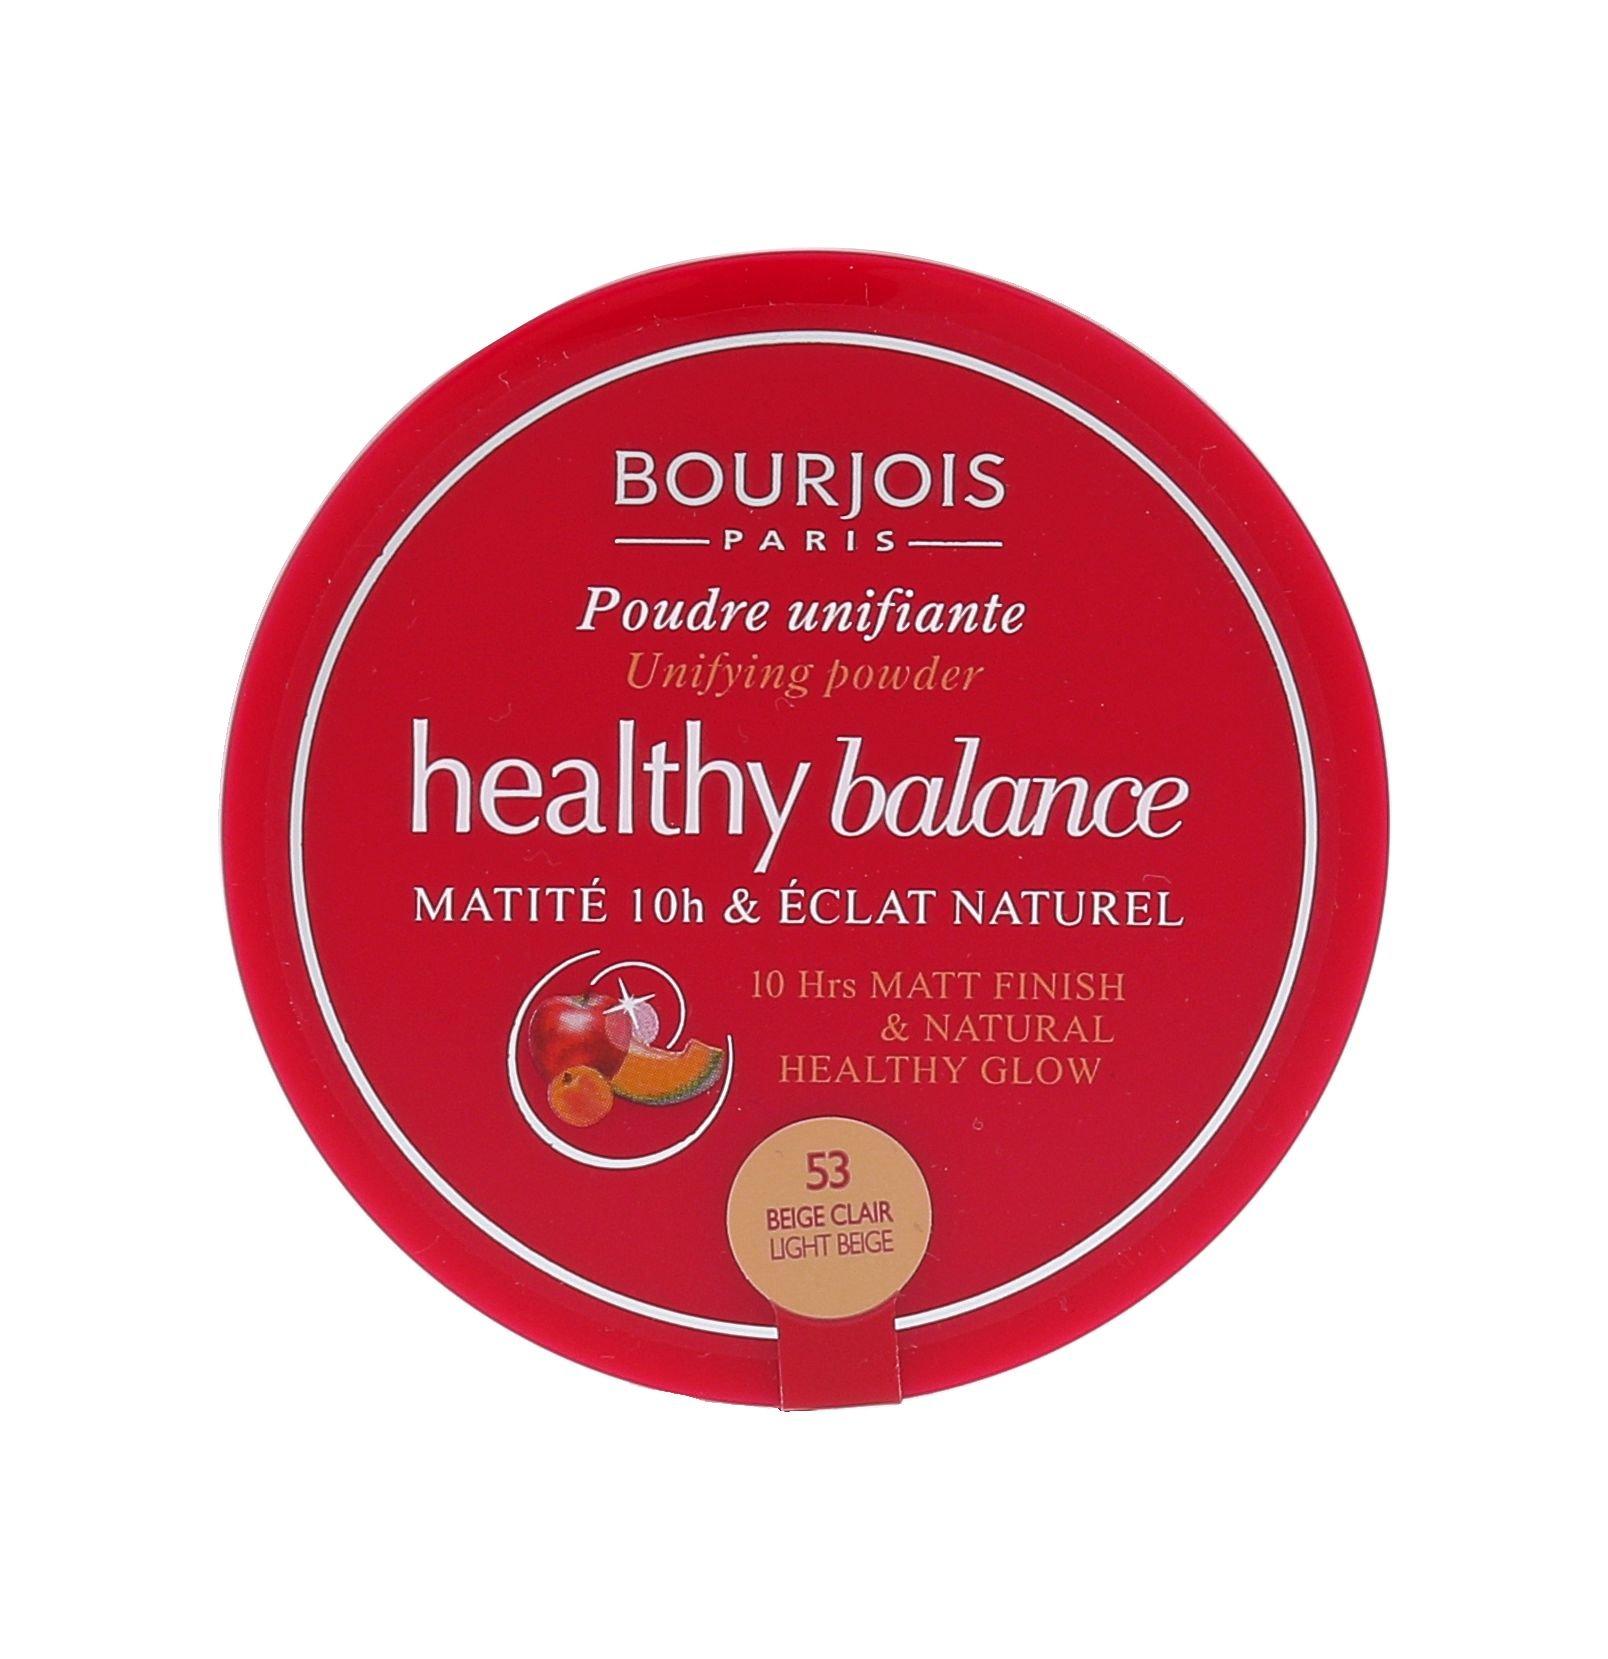 BOURJOIS Paris Healthy Balance Cosmetic 9ml 53 Light Beige